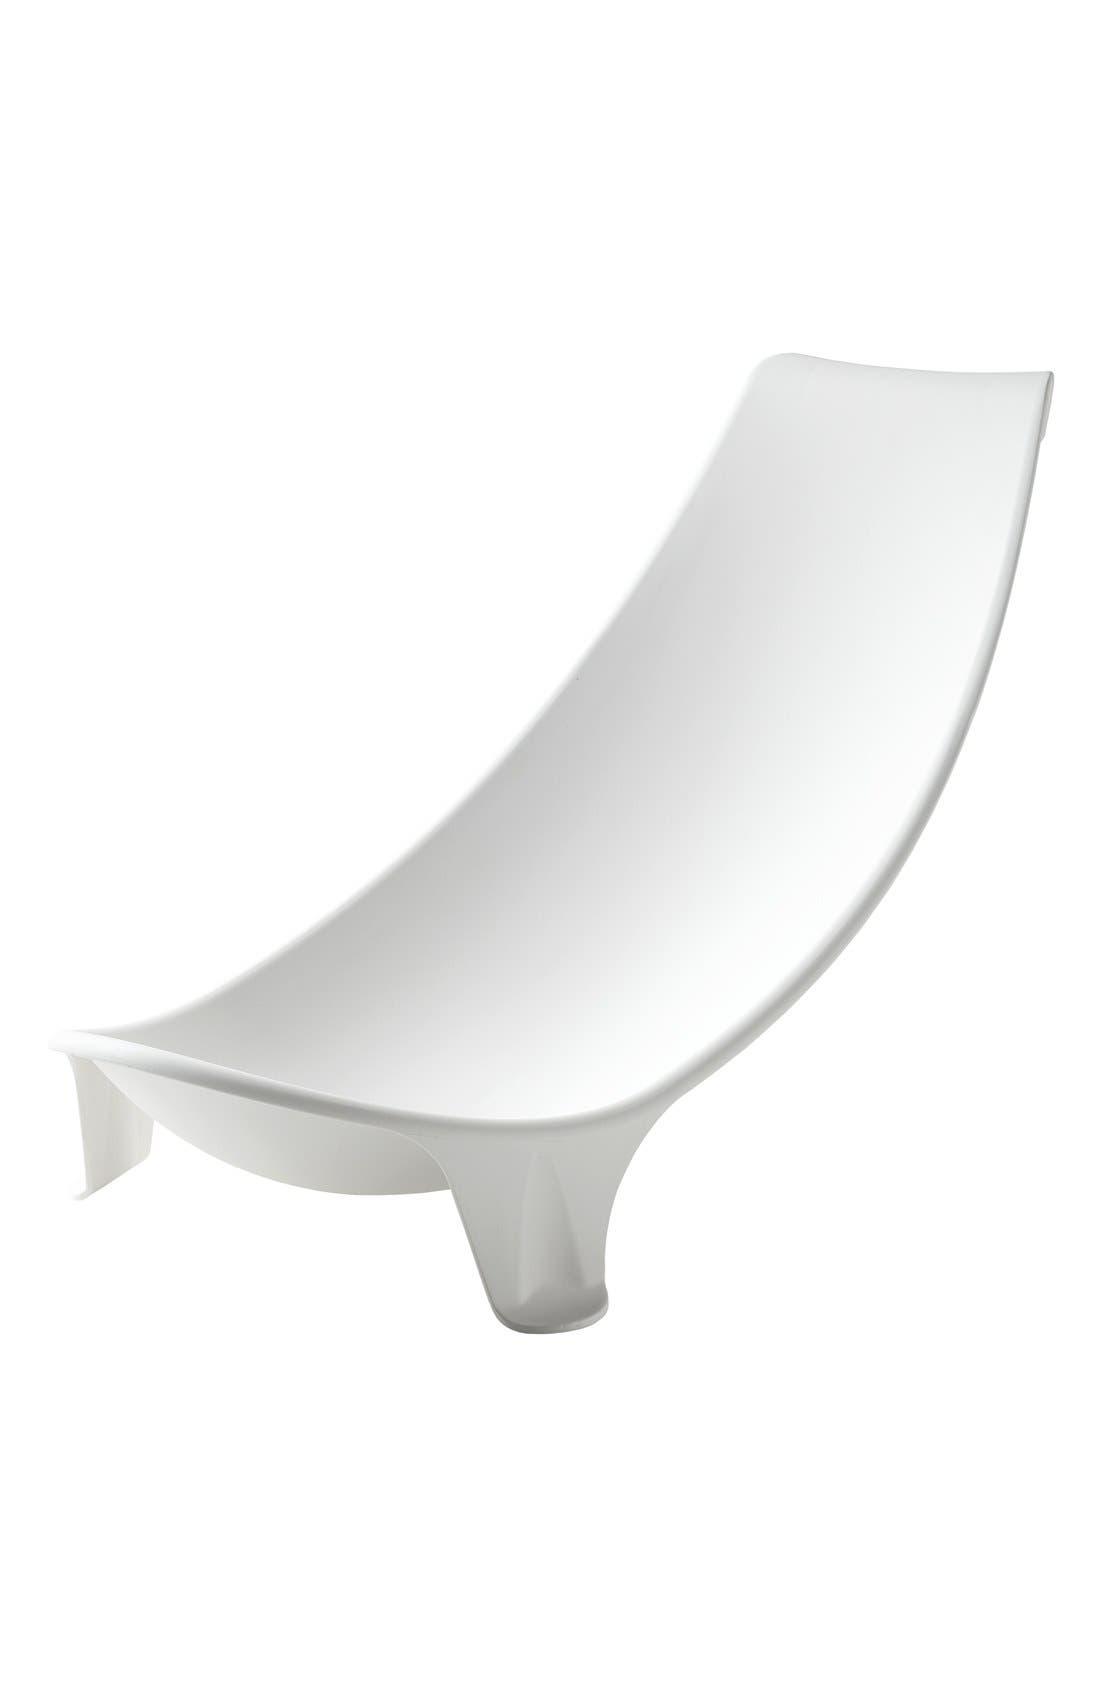 'Flexi Bath<sup>®</sup>' Newborn Support,                             Main thumbnail 1, color,                             WHITE